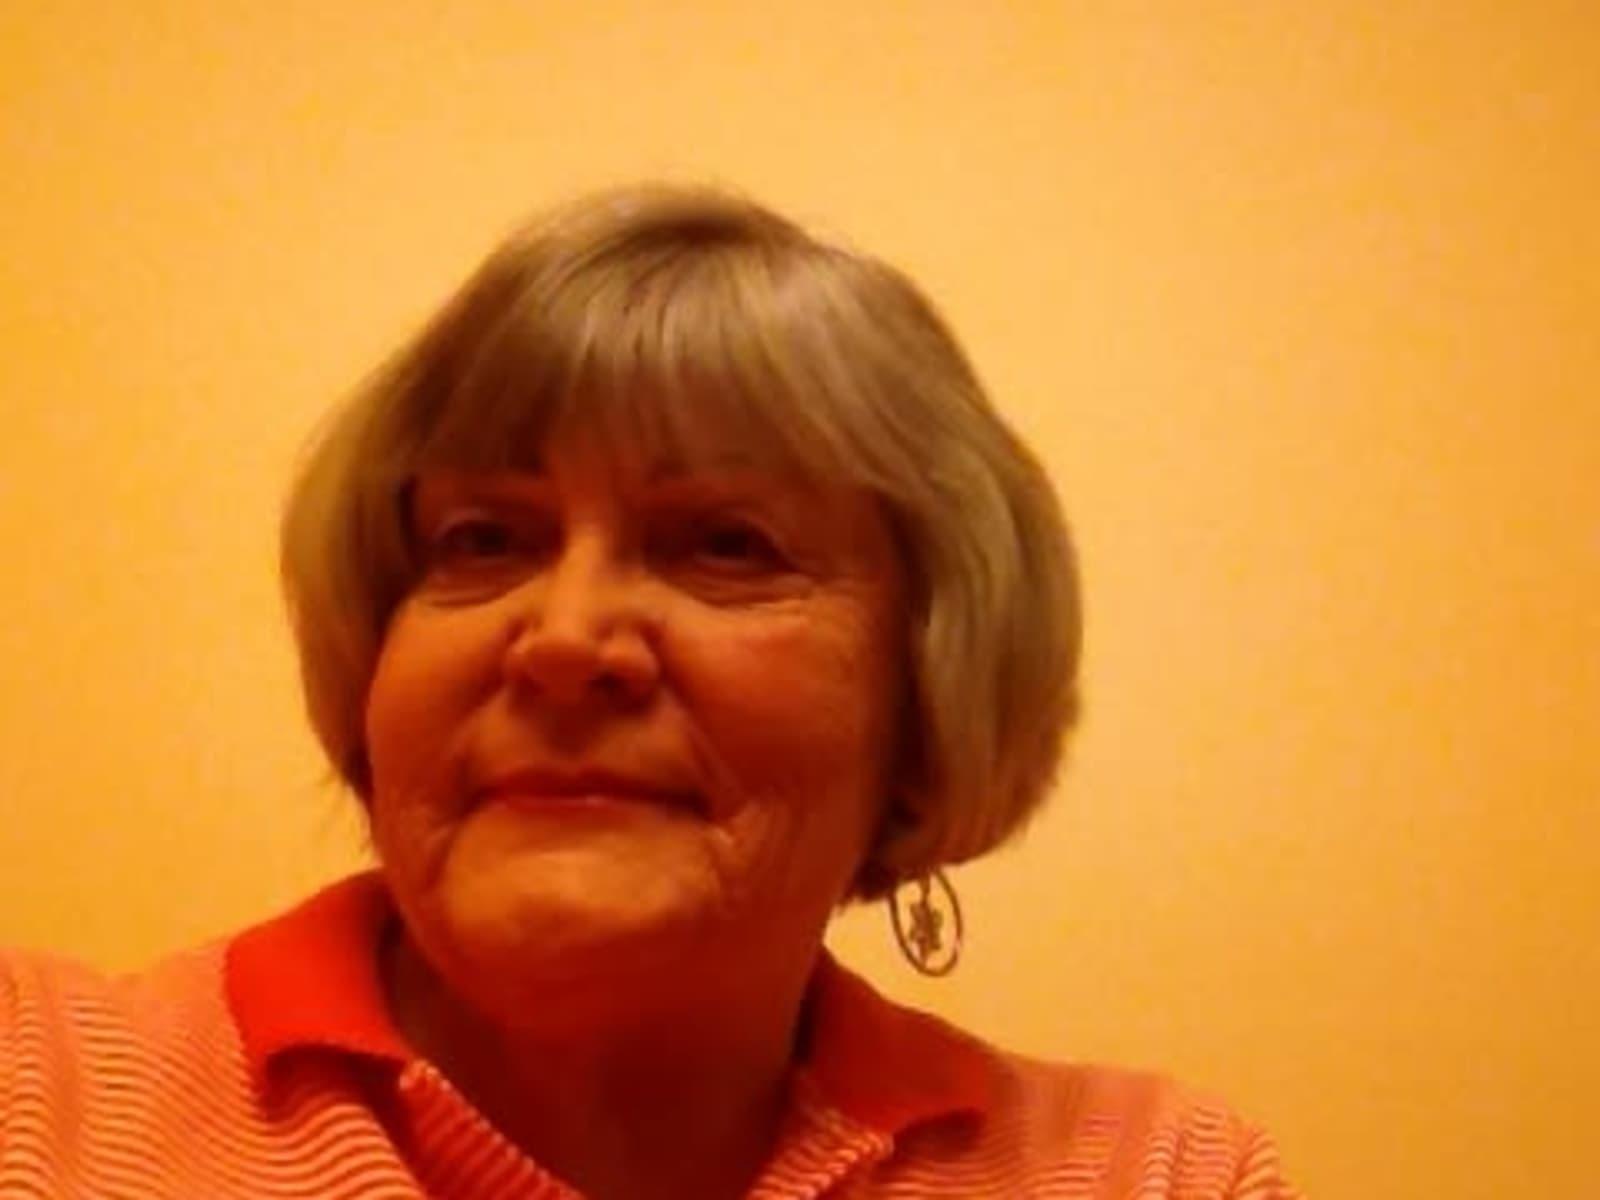 Maeann from Dayton, Ohio, United States